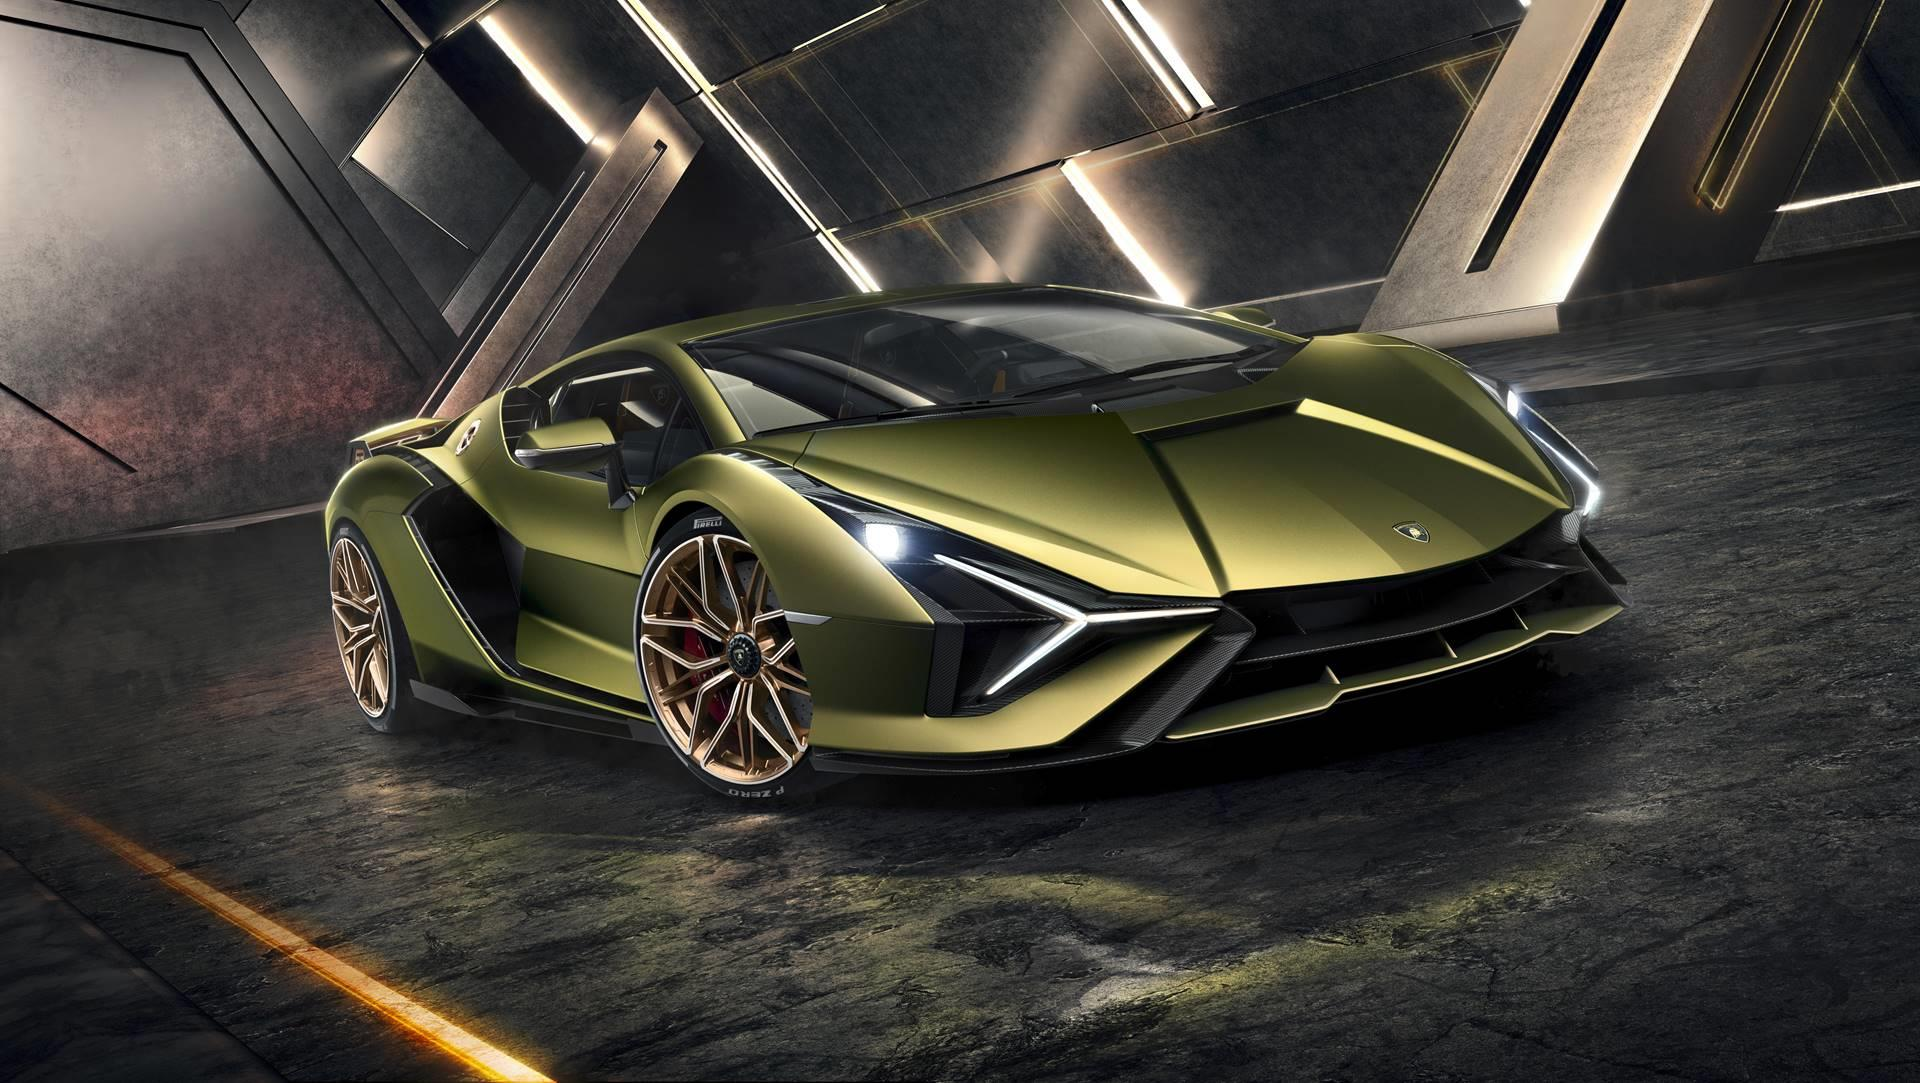 2019 Lamborghini Si 225 N News And Information Conceptcarz Com